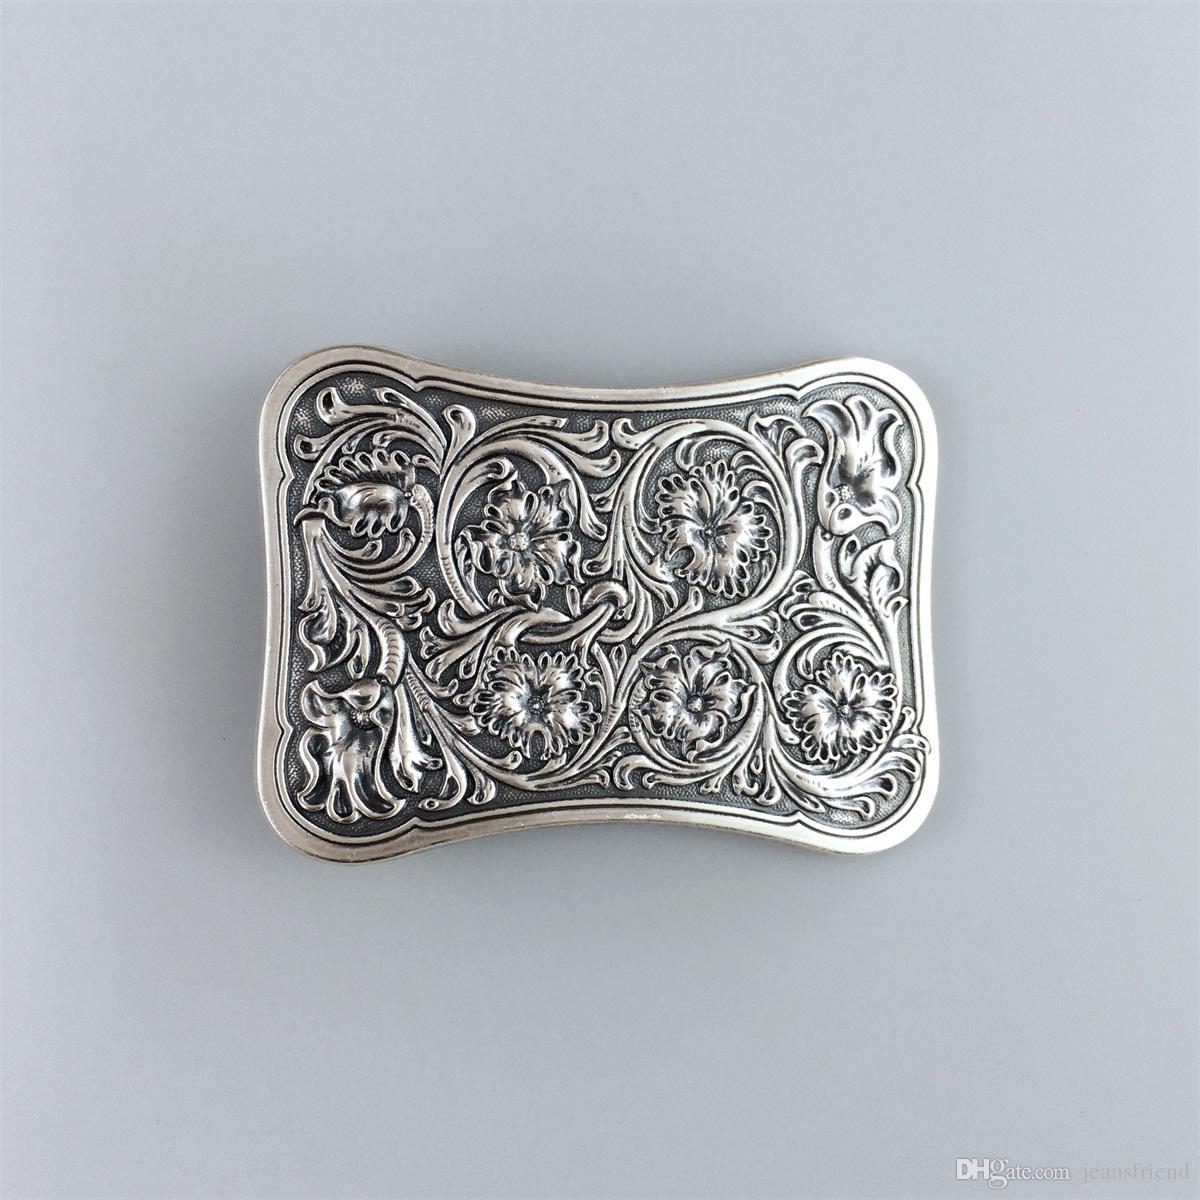 New Original Vintage Silver Plated Western Flower Southwest Rectangle Belt Buckle Gurtelschnalle Boucle de ceinture